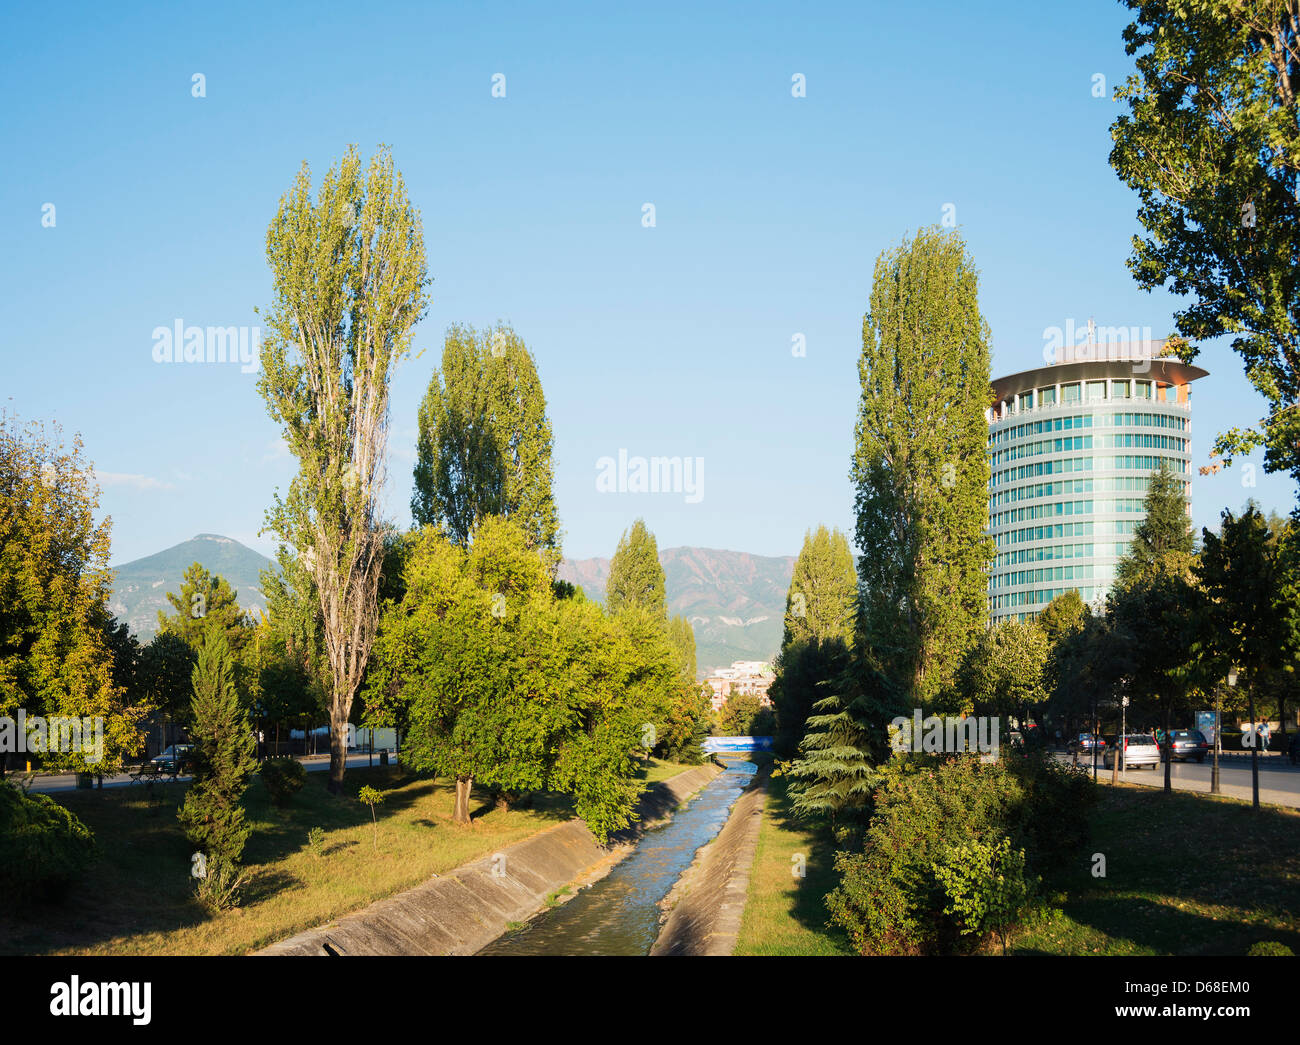 Europe, Albania, Tirana - Stock Image